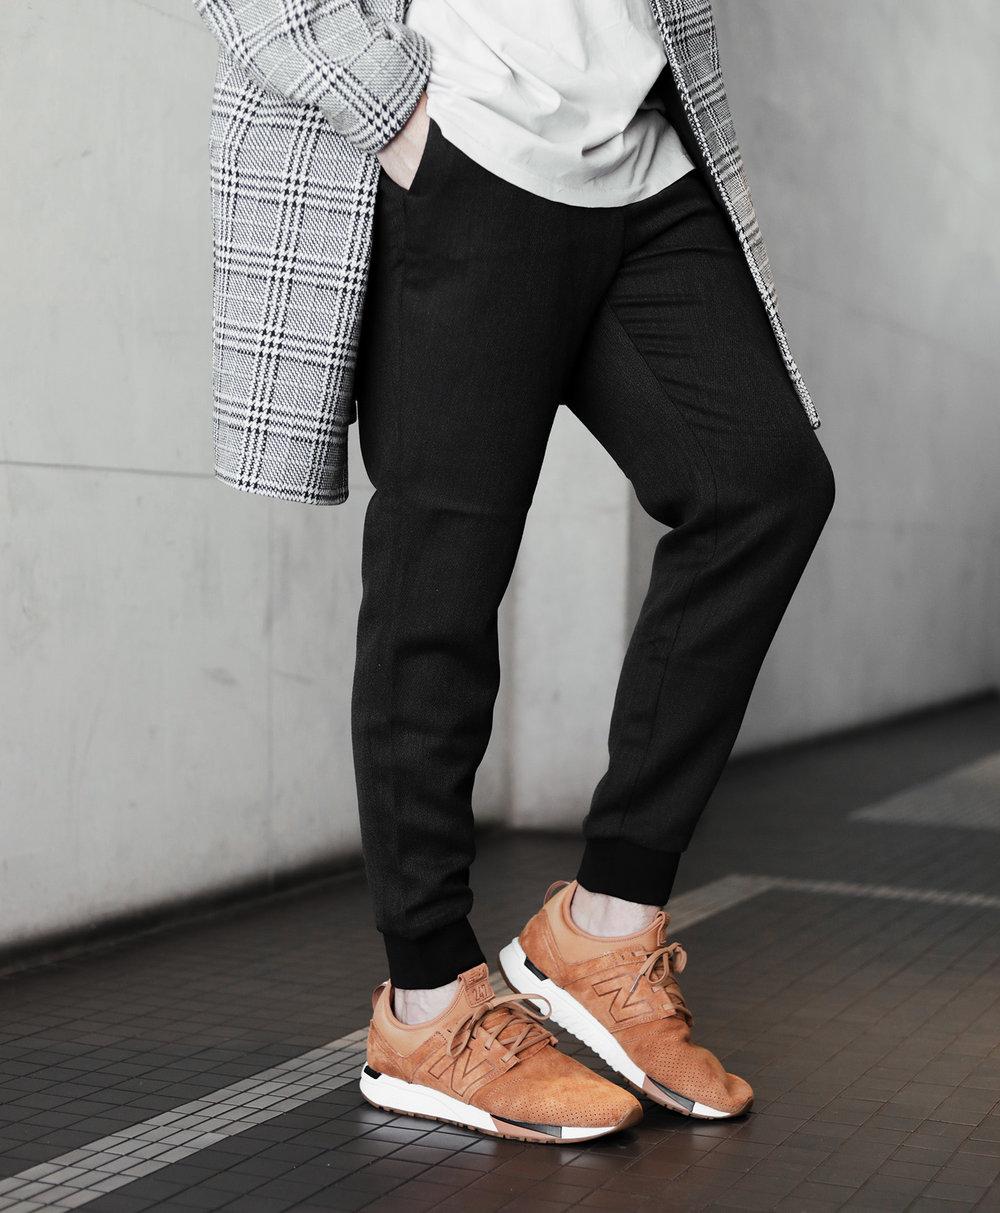 Jaheb_Barnett_Auckland_New_Zealand_fashion_blogger_New_Balance_11.jpg